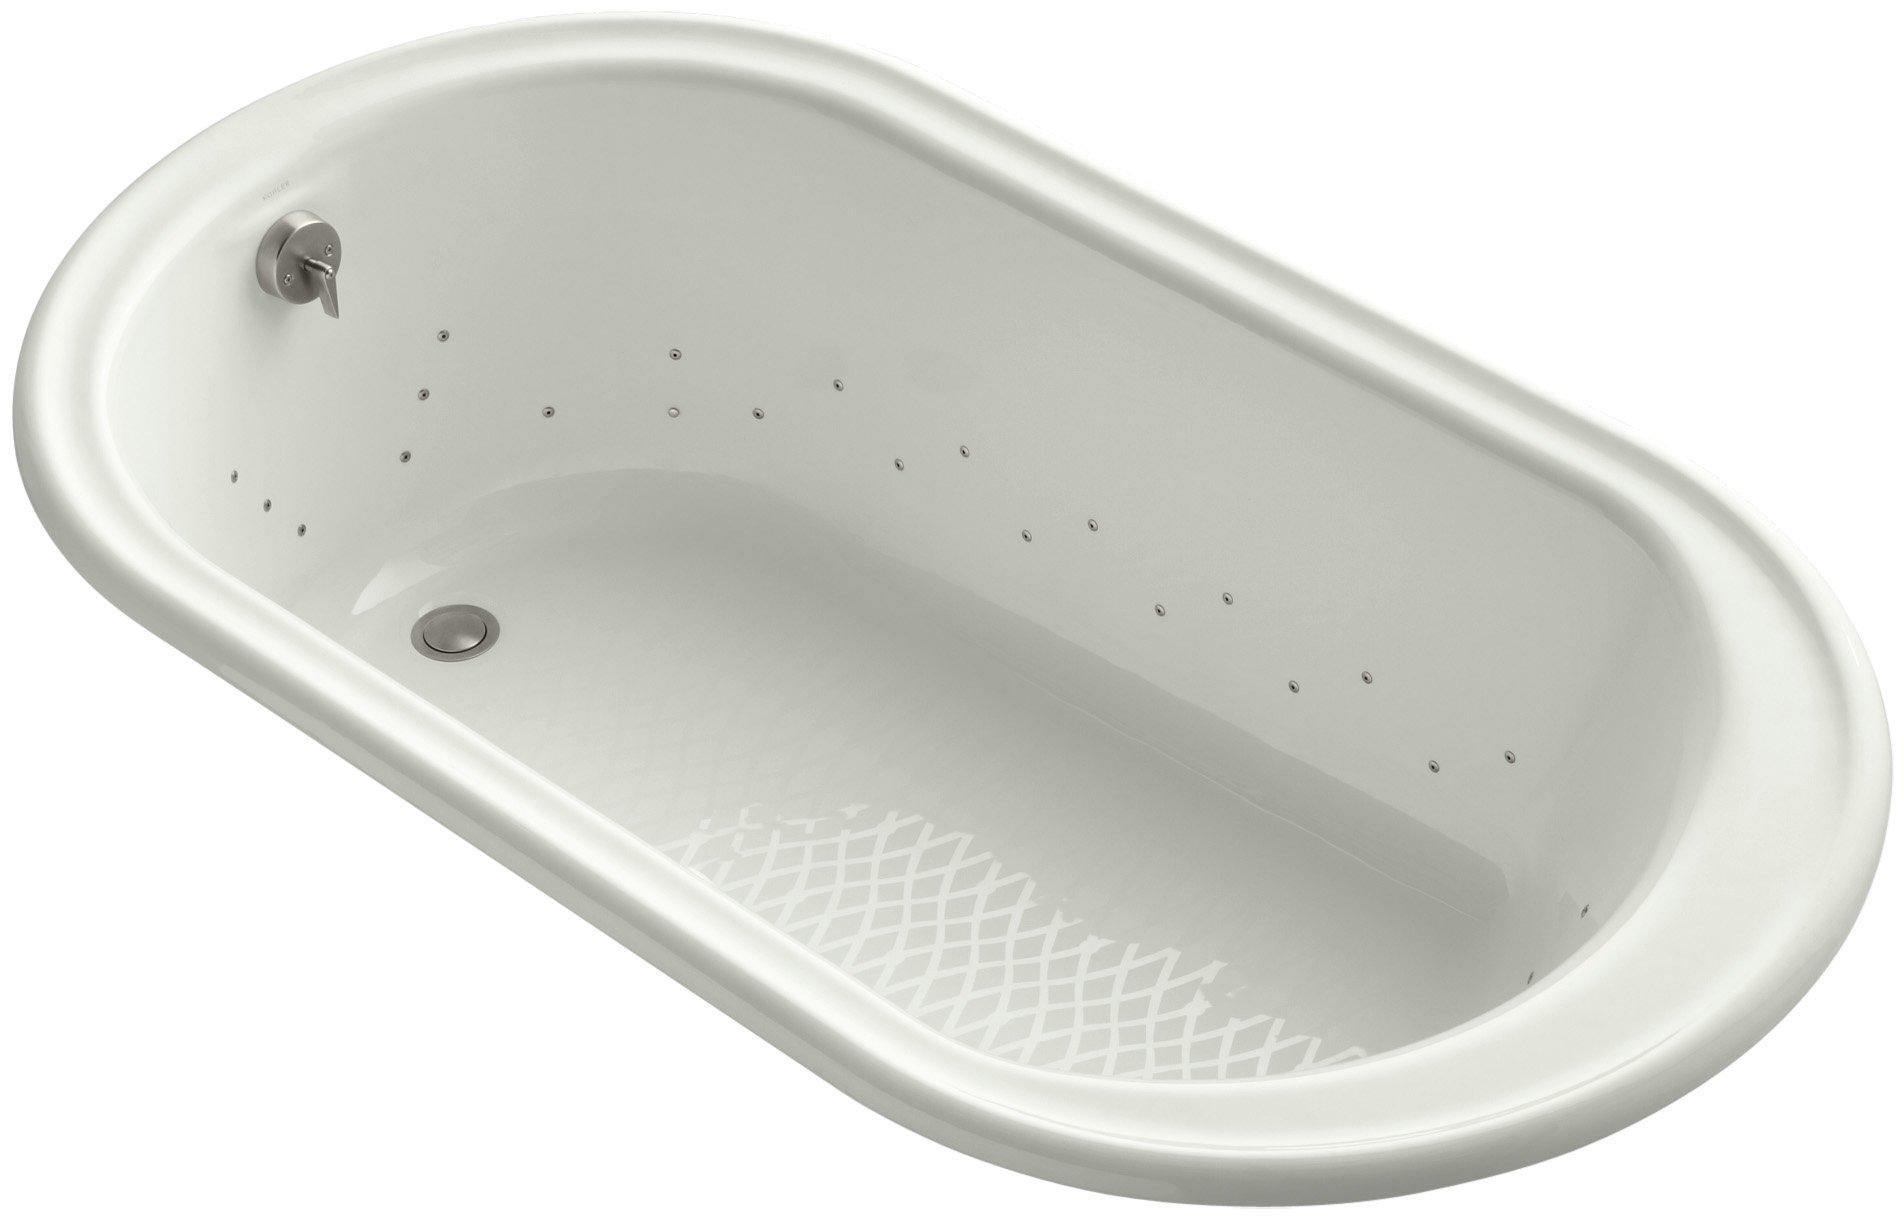 Kohler K-712-GBN-NY Iron Works Bubblemassage 5.5Ft Bath with Vibrant Brushed Nickel Airjet Color, Dune